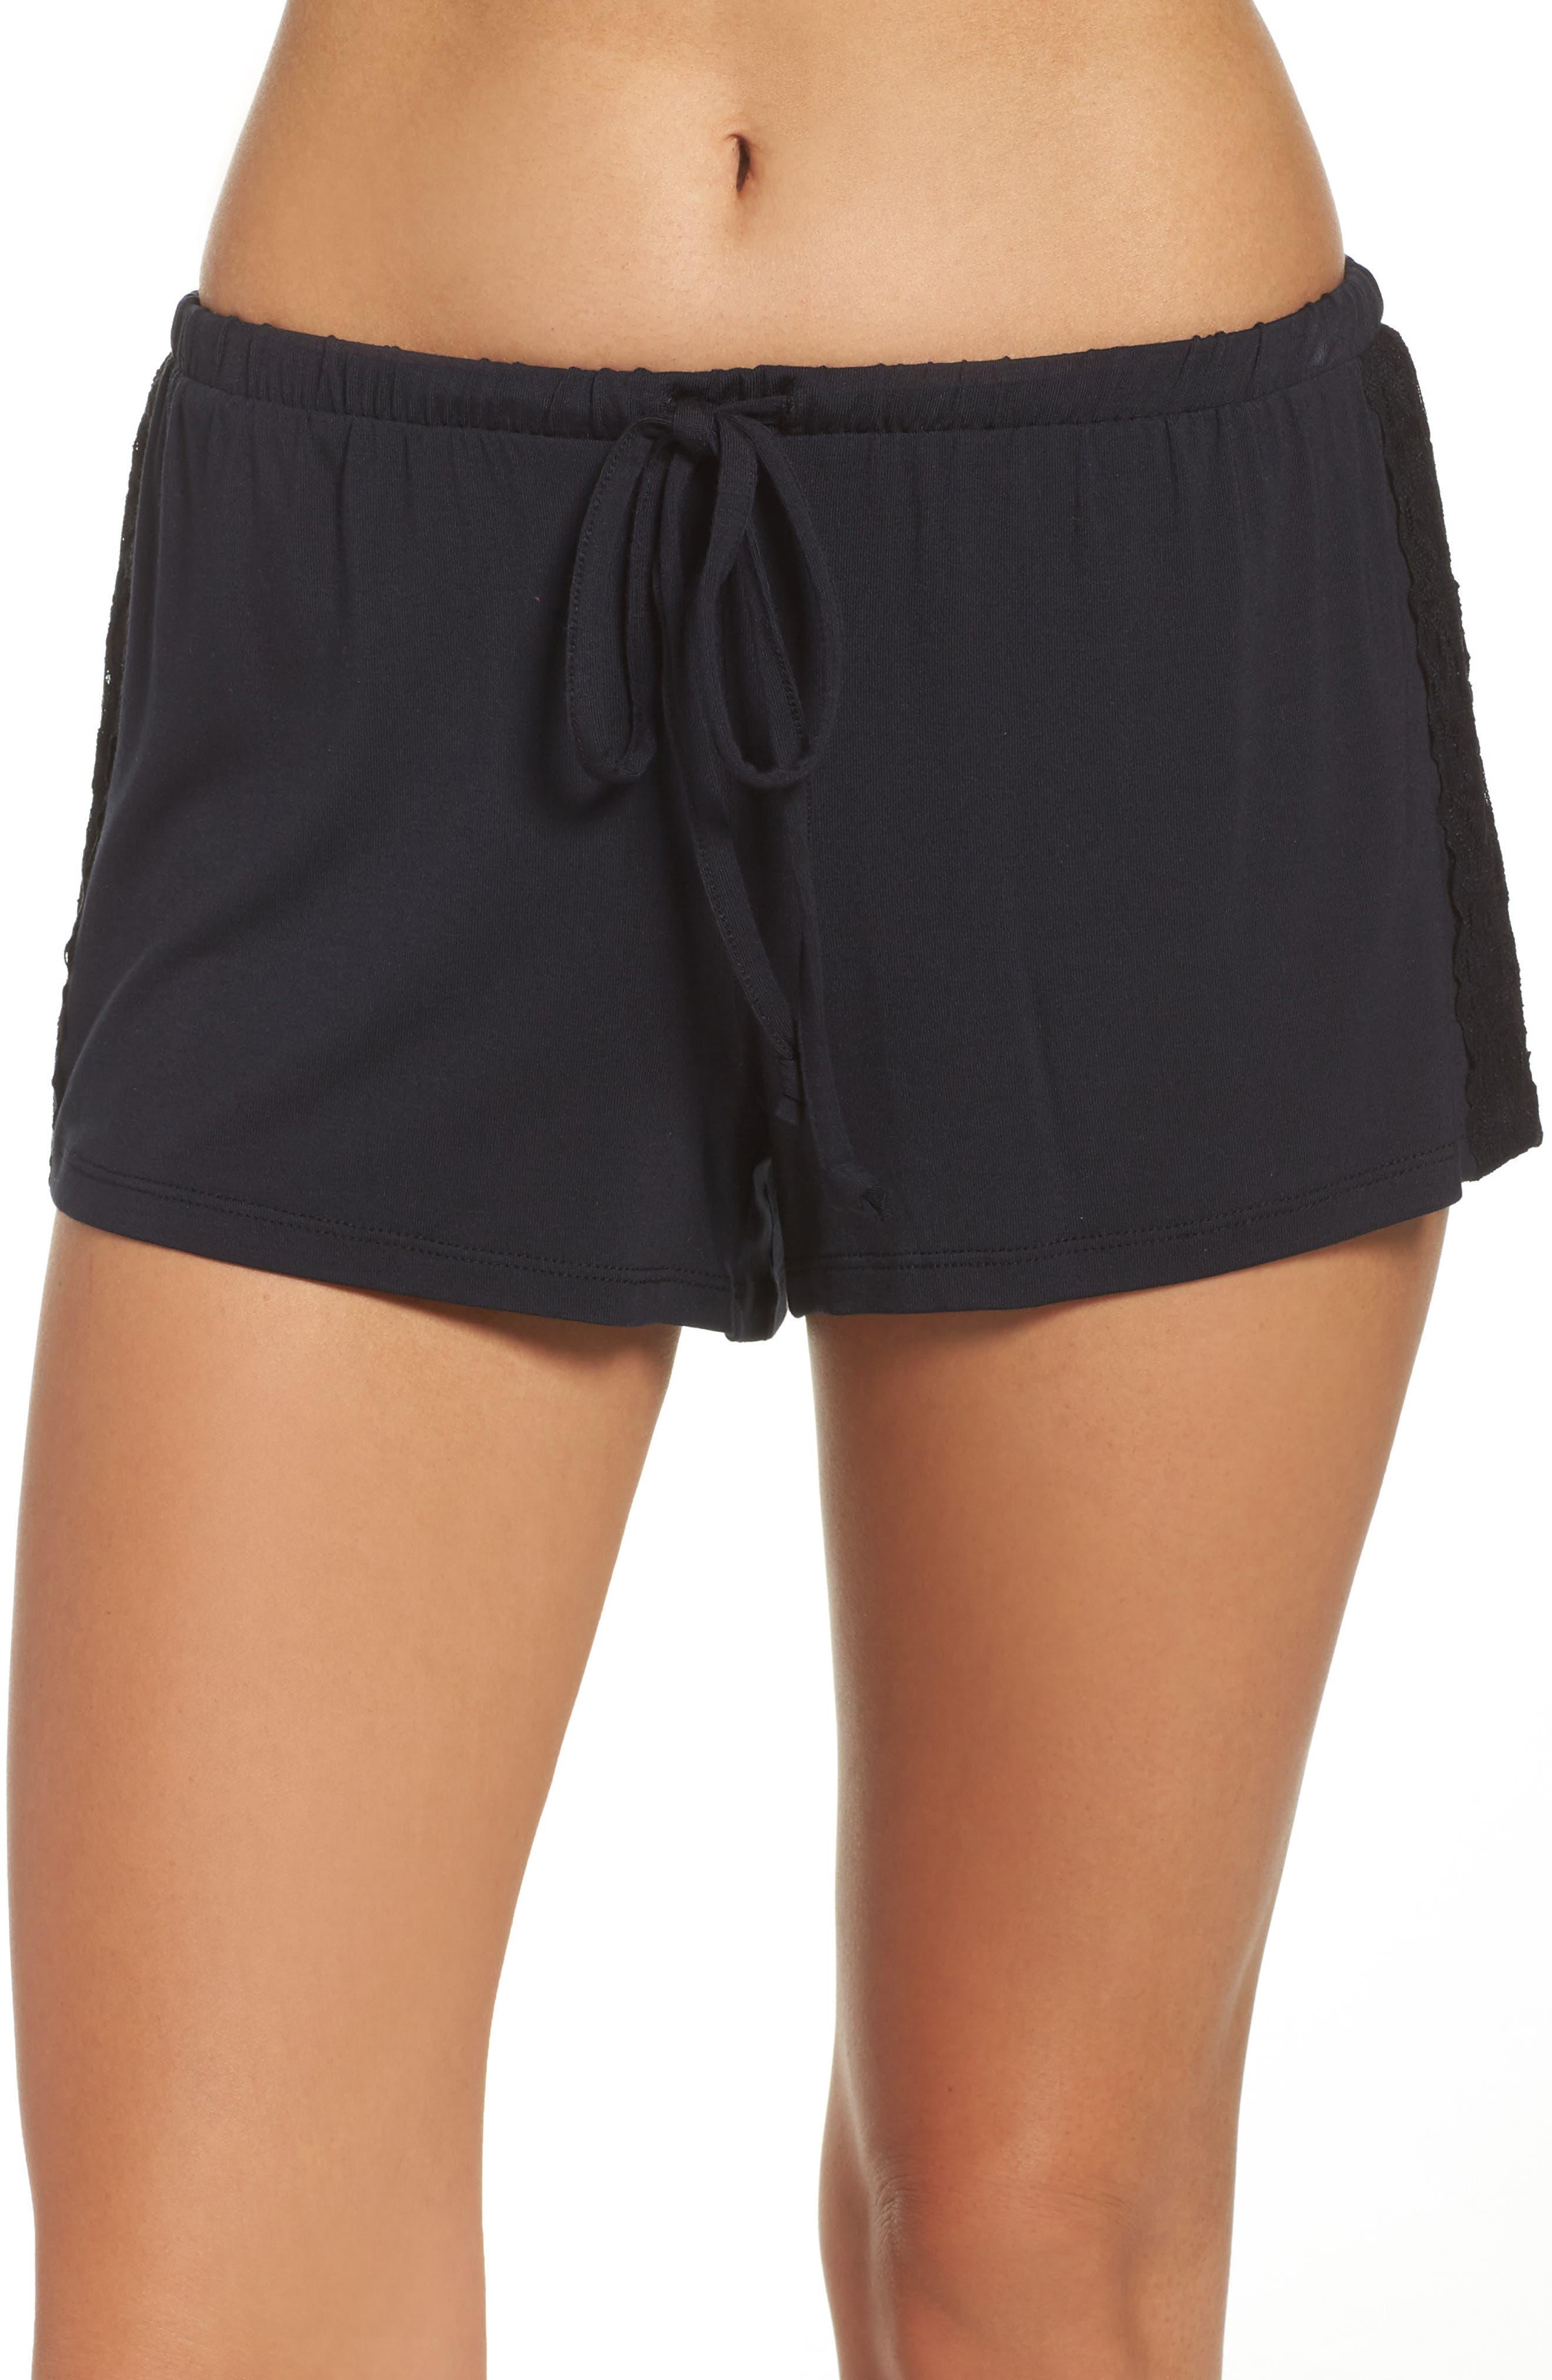 Lounge Shorts,                         Main,                         color, Black